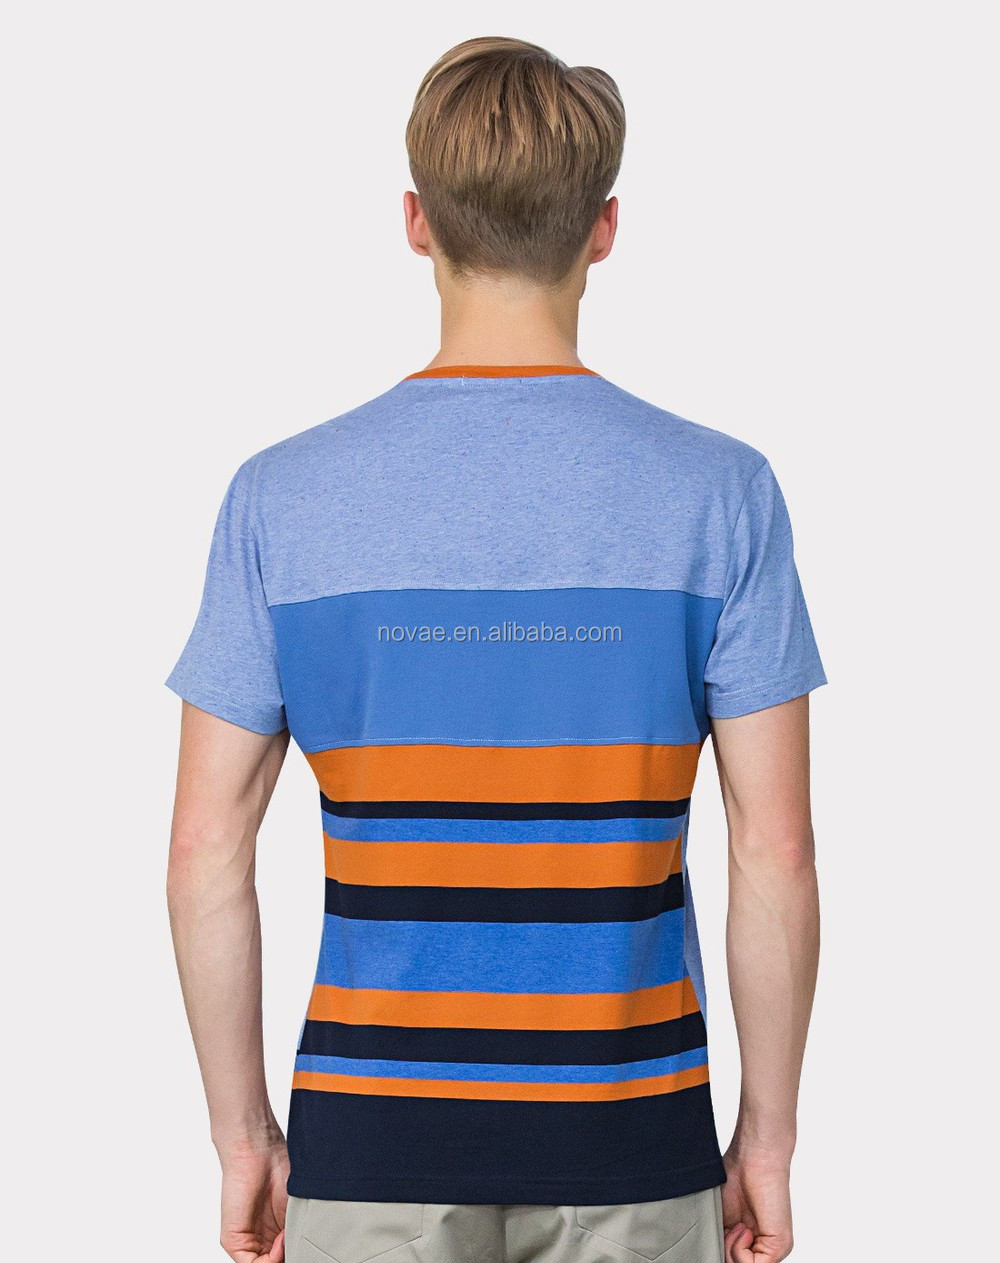 100 ring spun cotton t shirt blank pocket t shirt for Bulk pocket t shirts